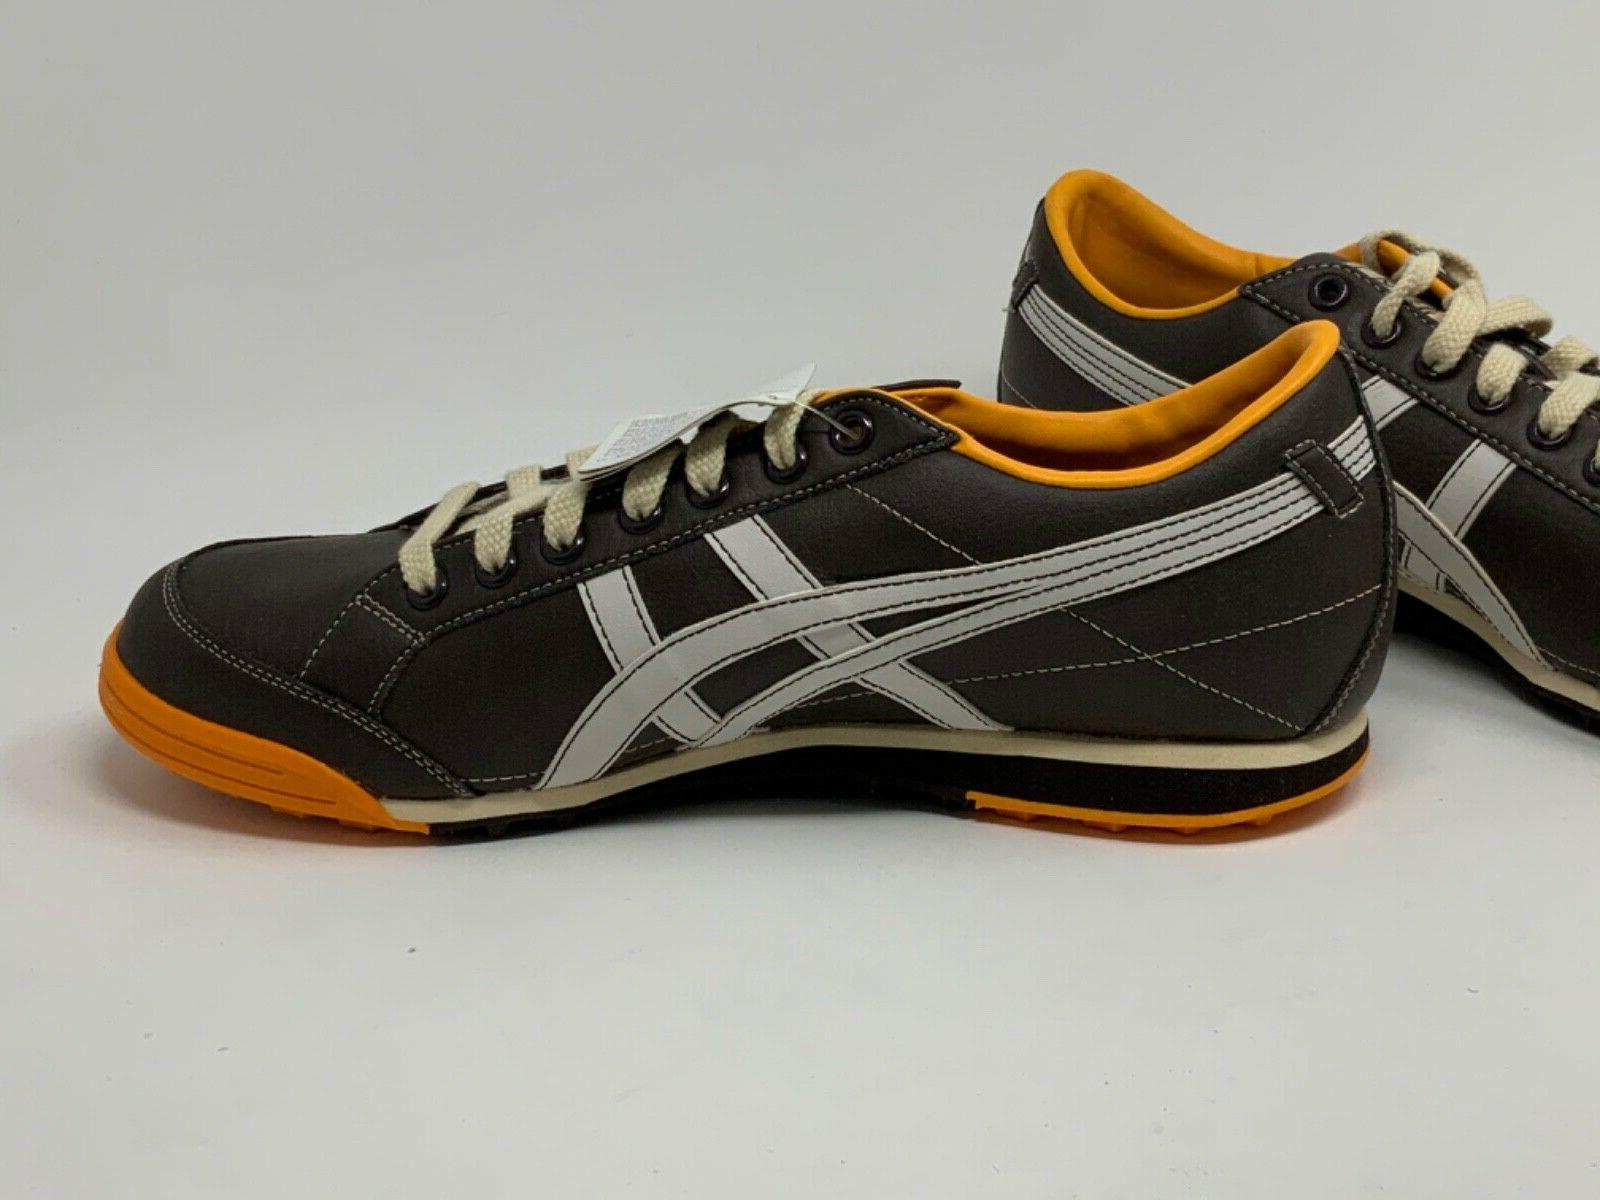 NEW! Asics Matchplay Classic Shoe 9.5** CIRCA 2013